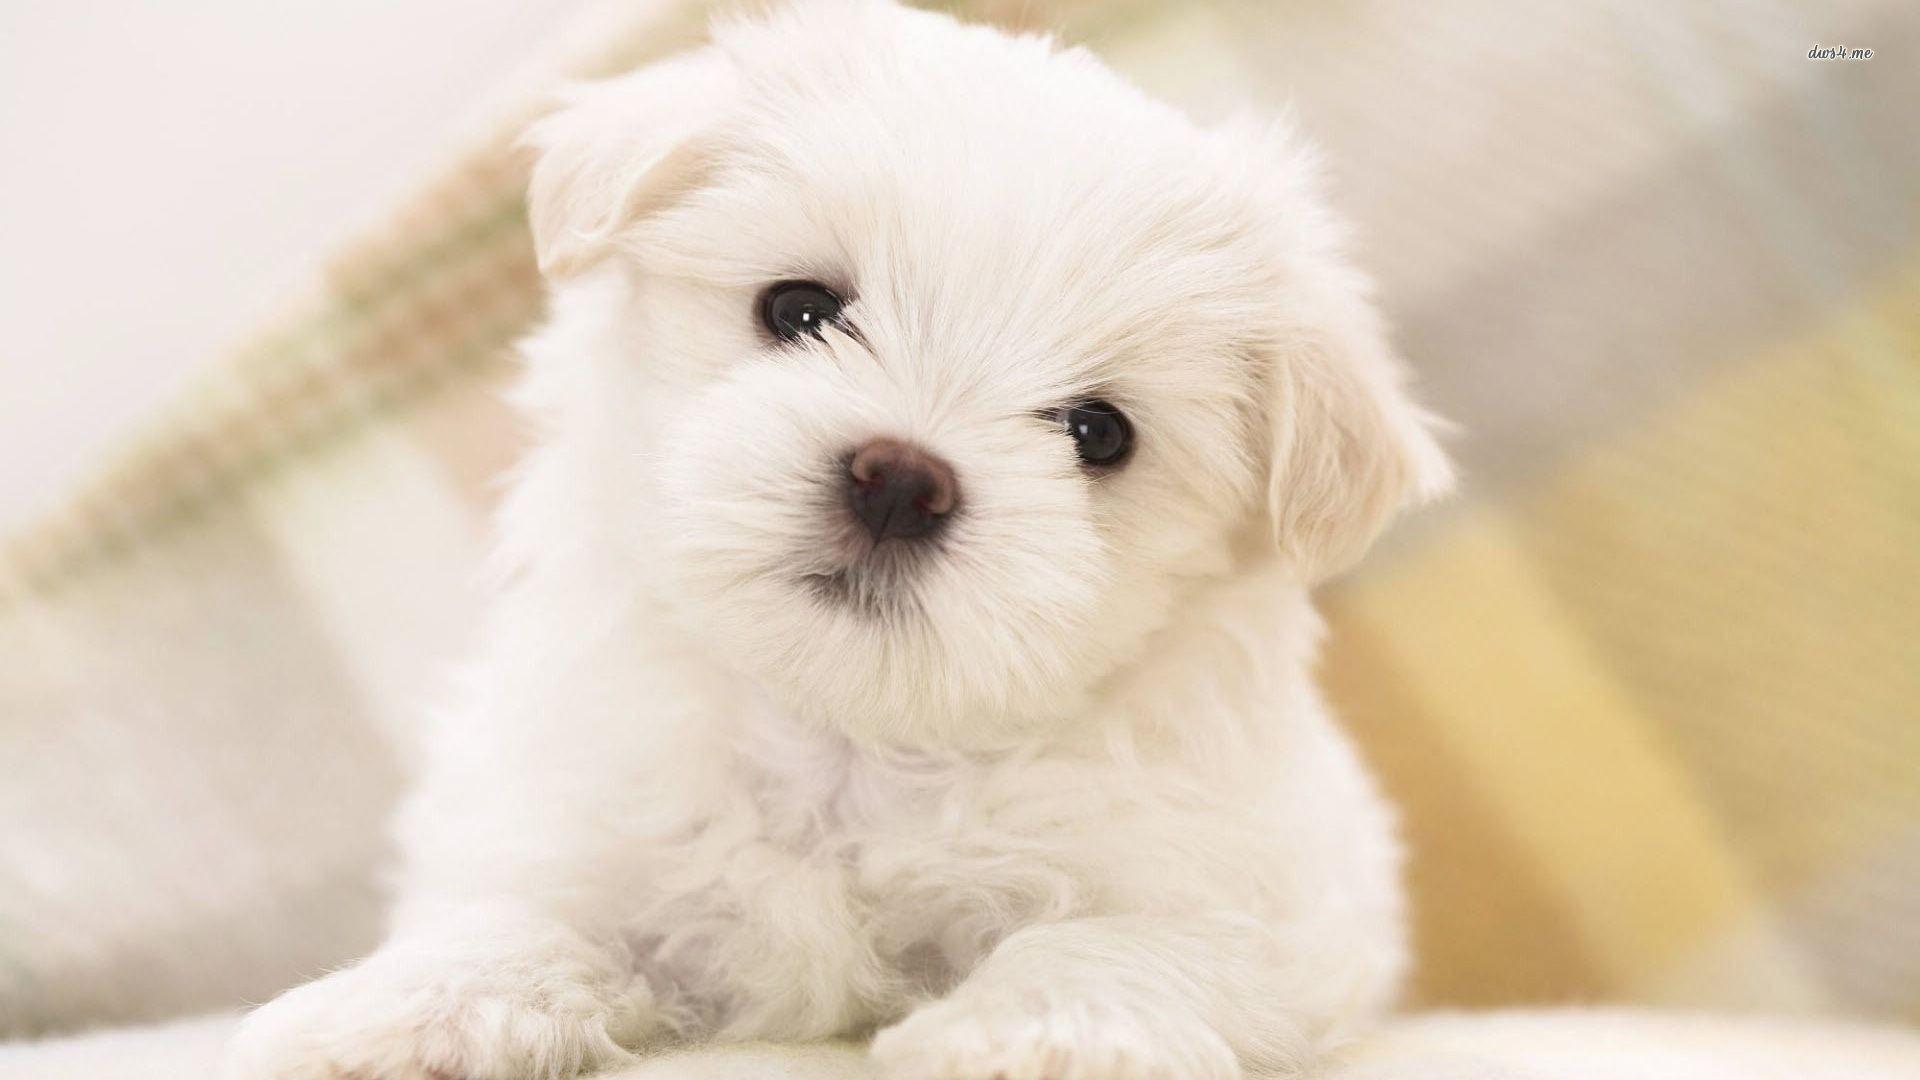 Cute Pug Dog Wallpaper Free Download Pug Puppies Wallpaper